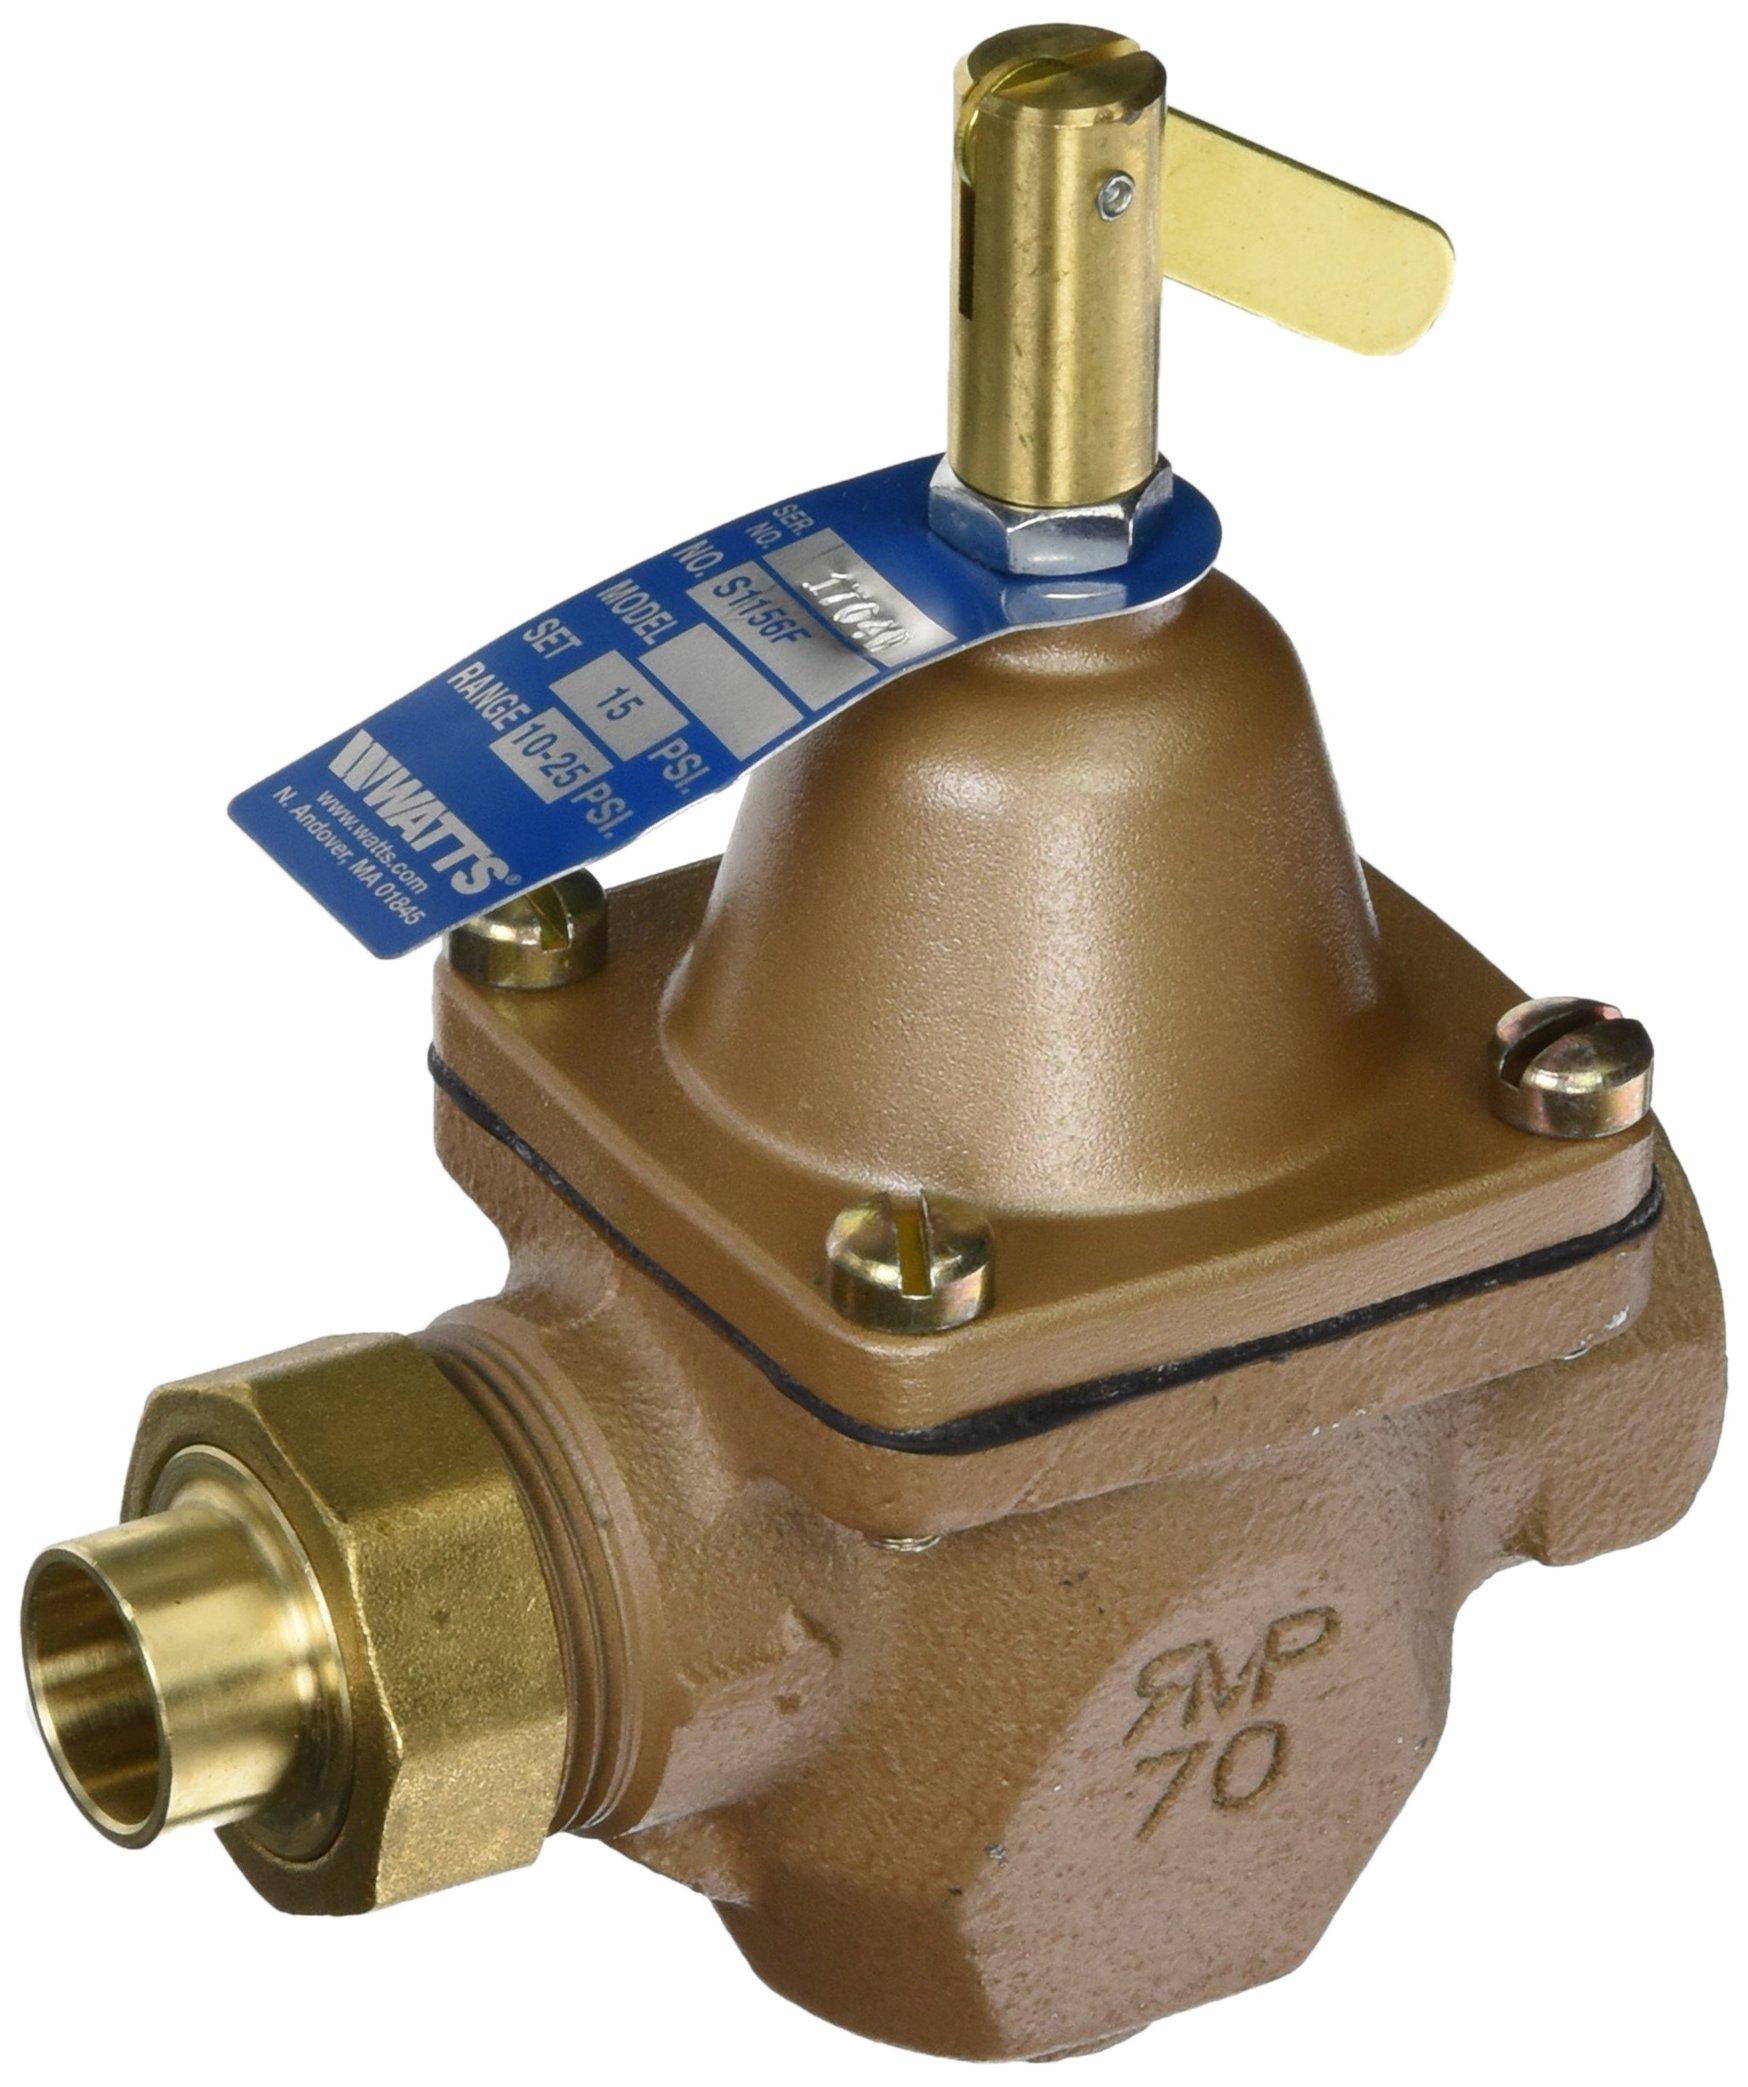 Watts SB1156F High Capacity Feed Water Pressure Regulators, 1/2 in. (15mm), Bronze, 1